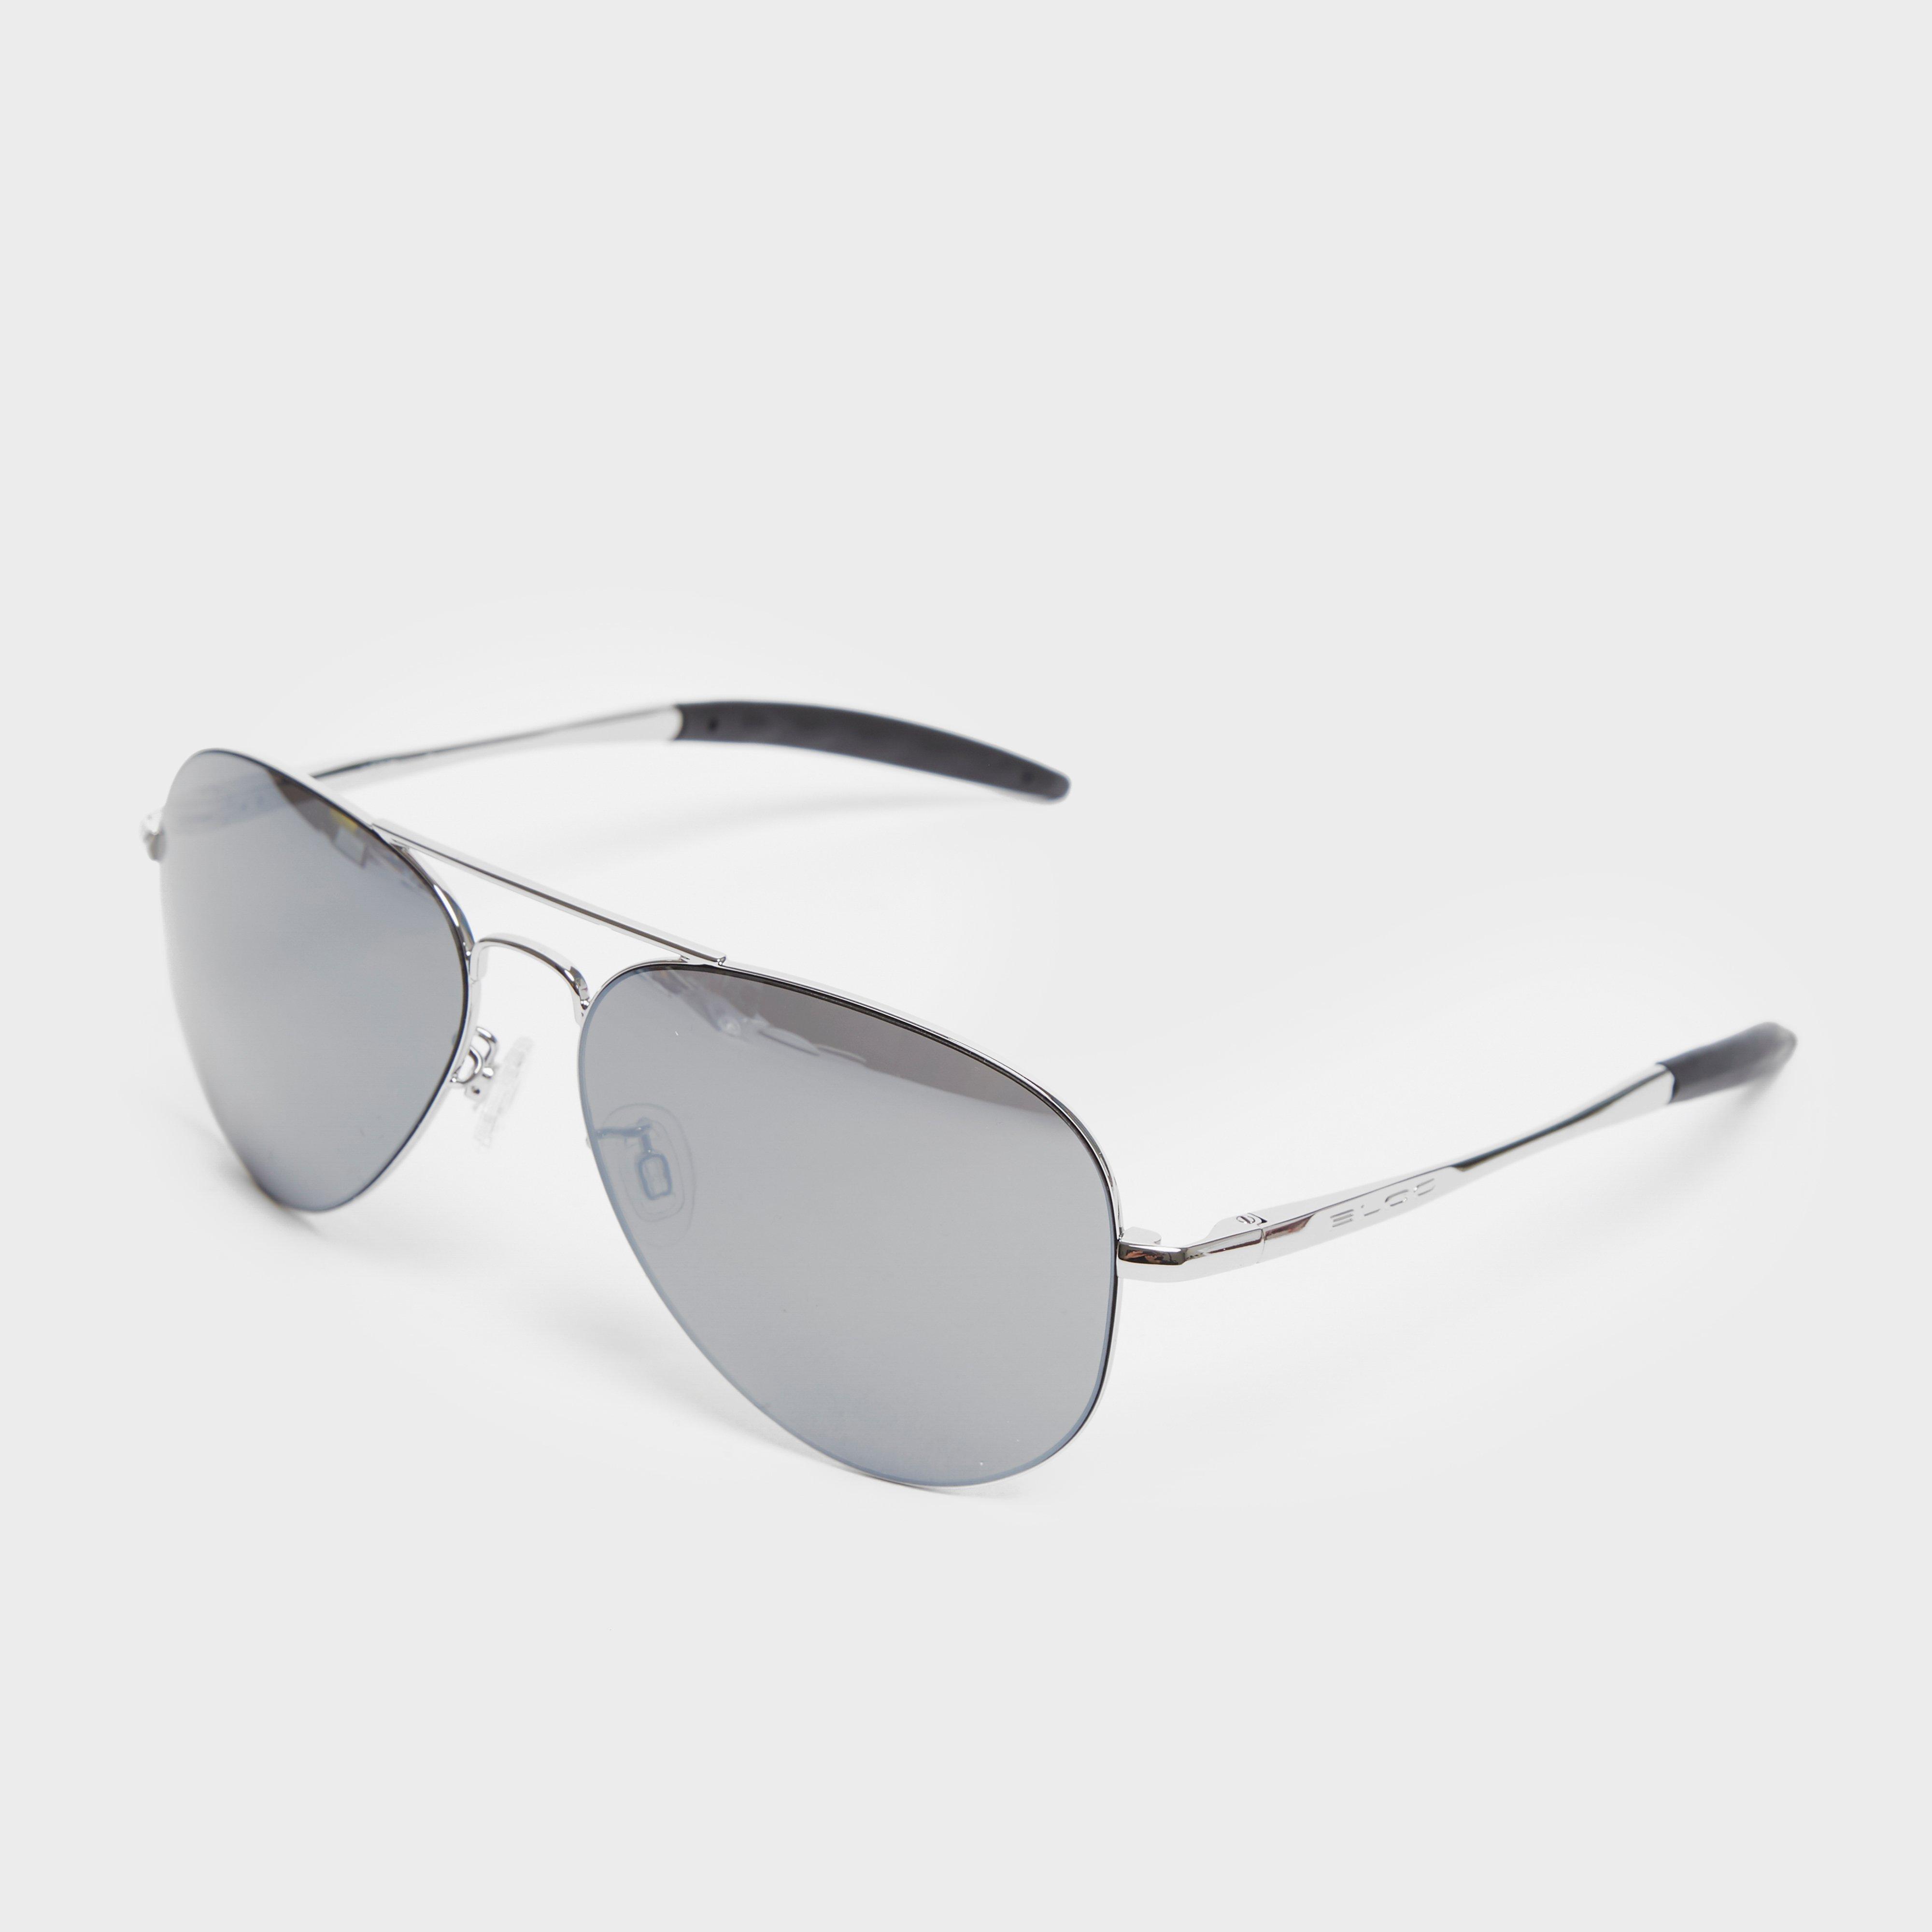 Bloc Bloc Darwin F927 Sunglasses - Black, Black